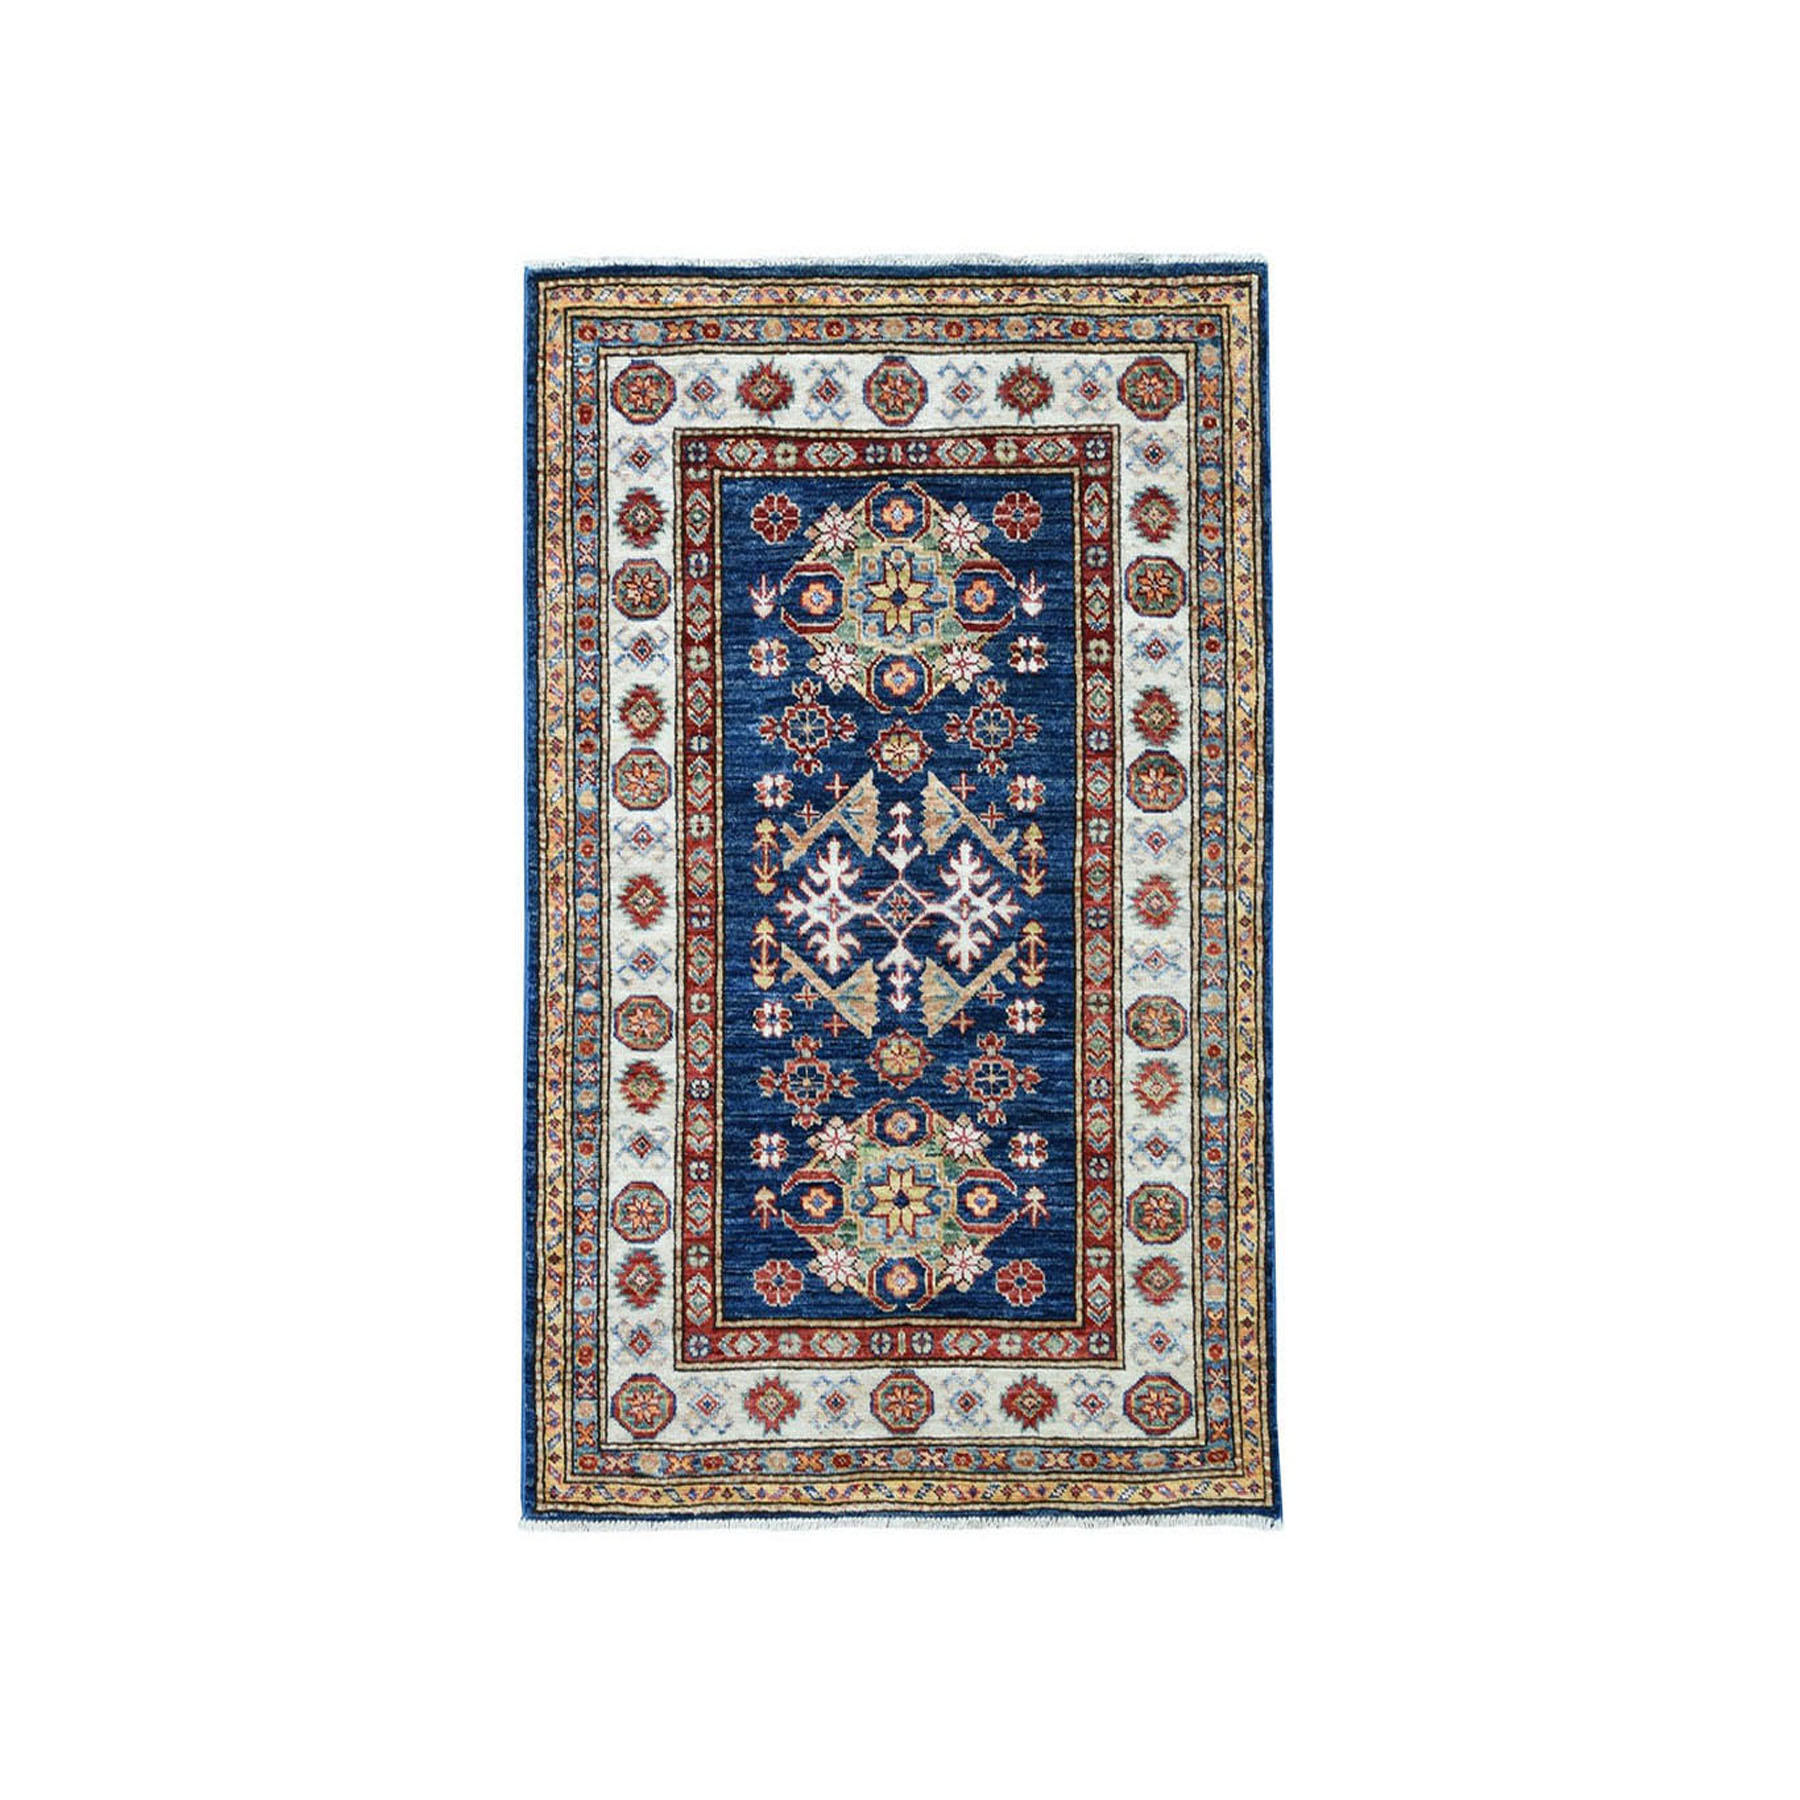 "2'10""X4'2"" Blue Super Kazak Pure Wool Geometric Design Hand-Knotted Oriental Rug moae066a"